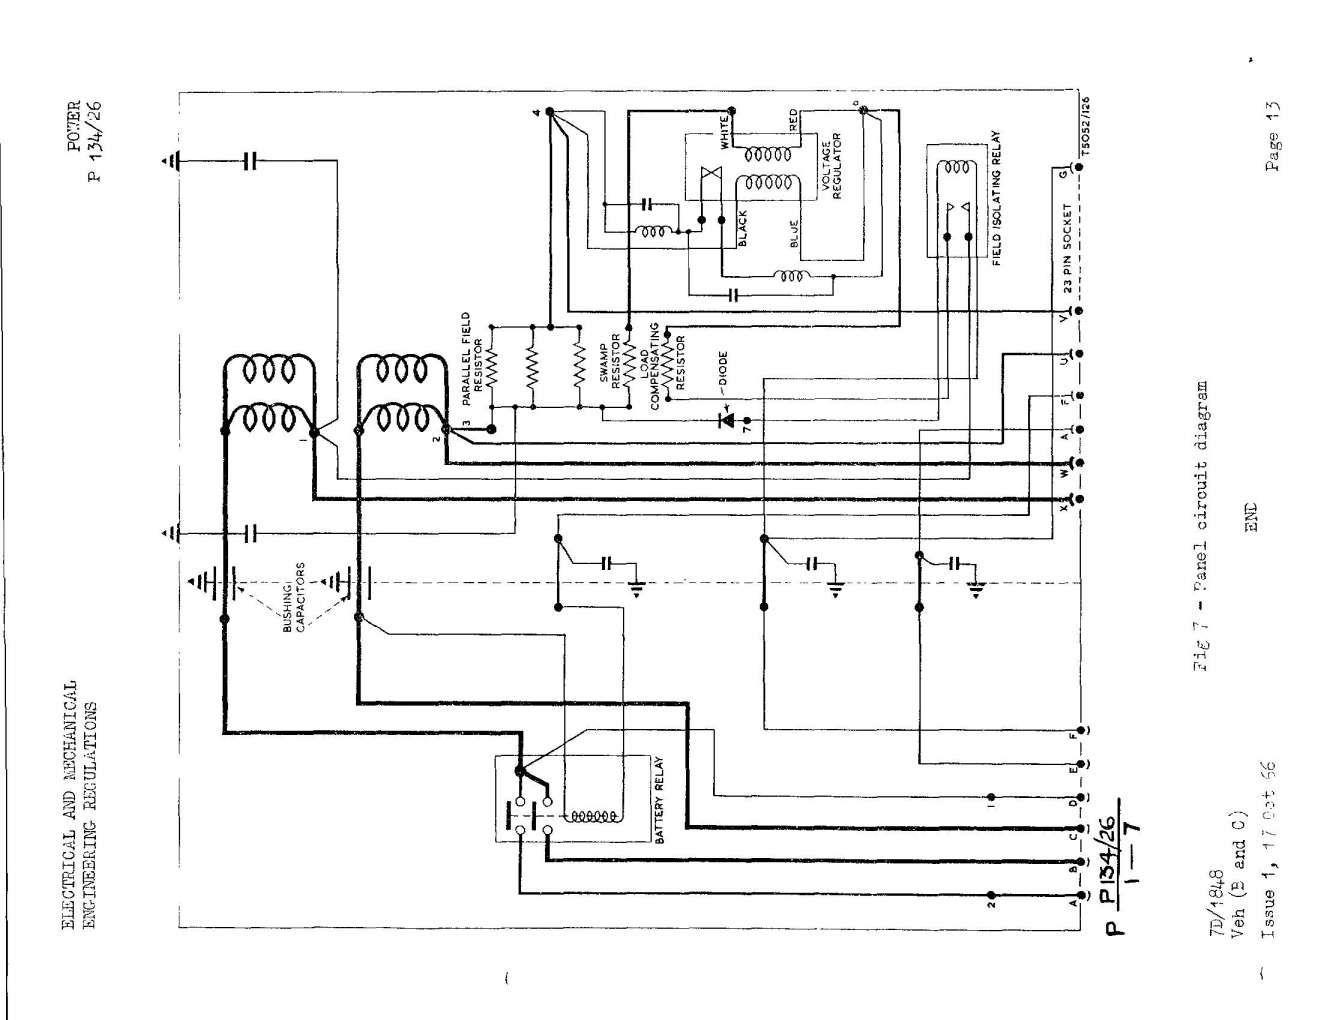 15 Bmw N52 Engine Wiring Diagram Engine Diagram Wiringg Net Electrical Wiring Diagram Diagram Electrical Wiring